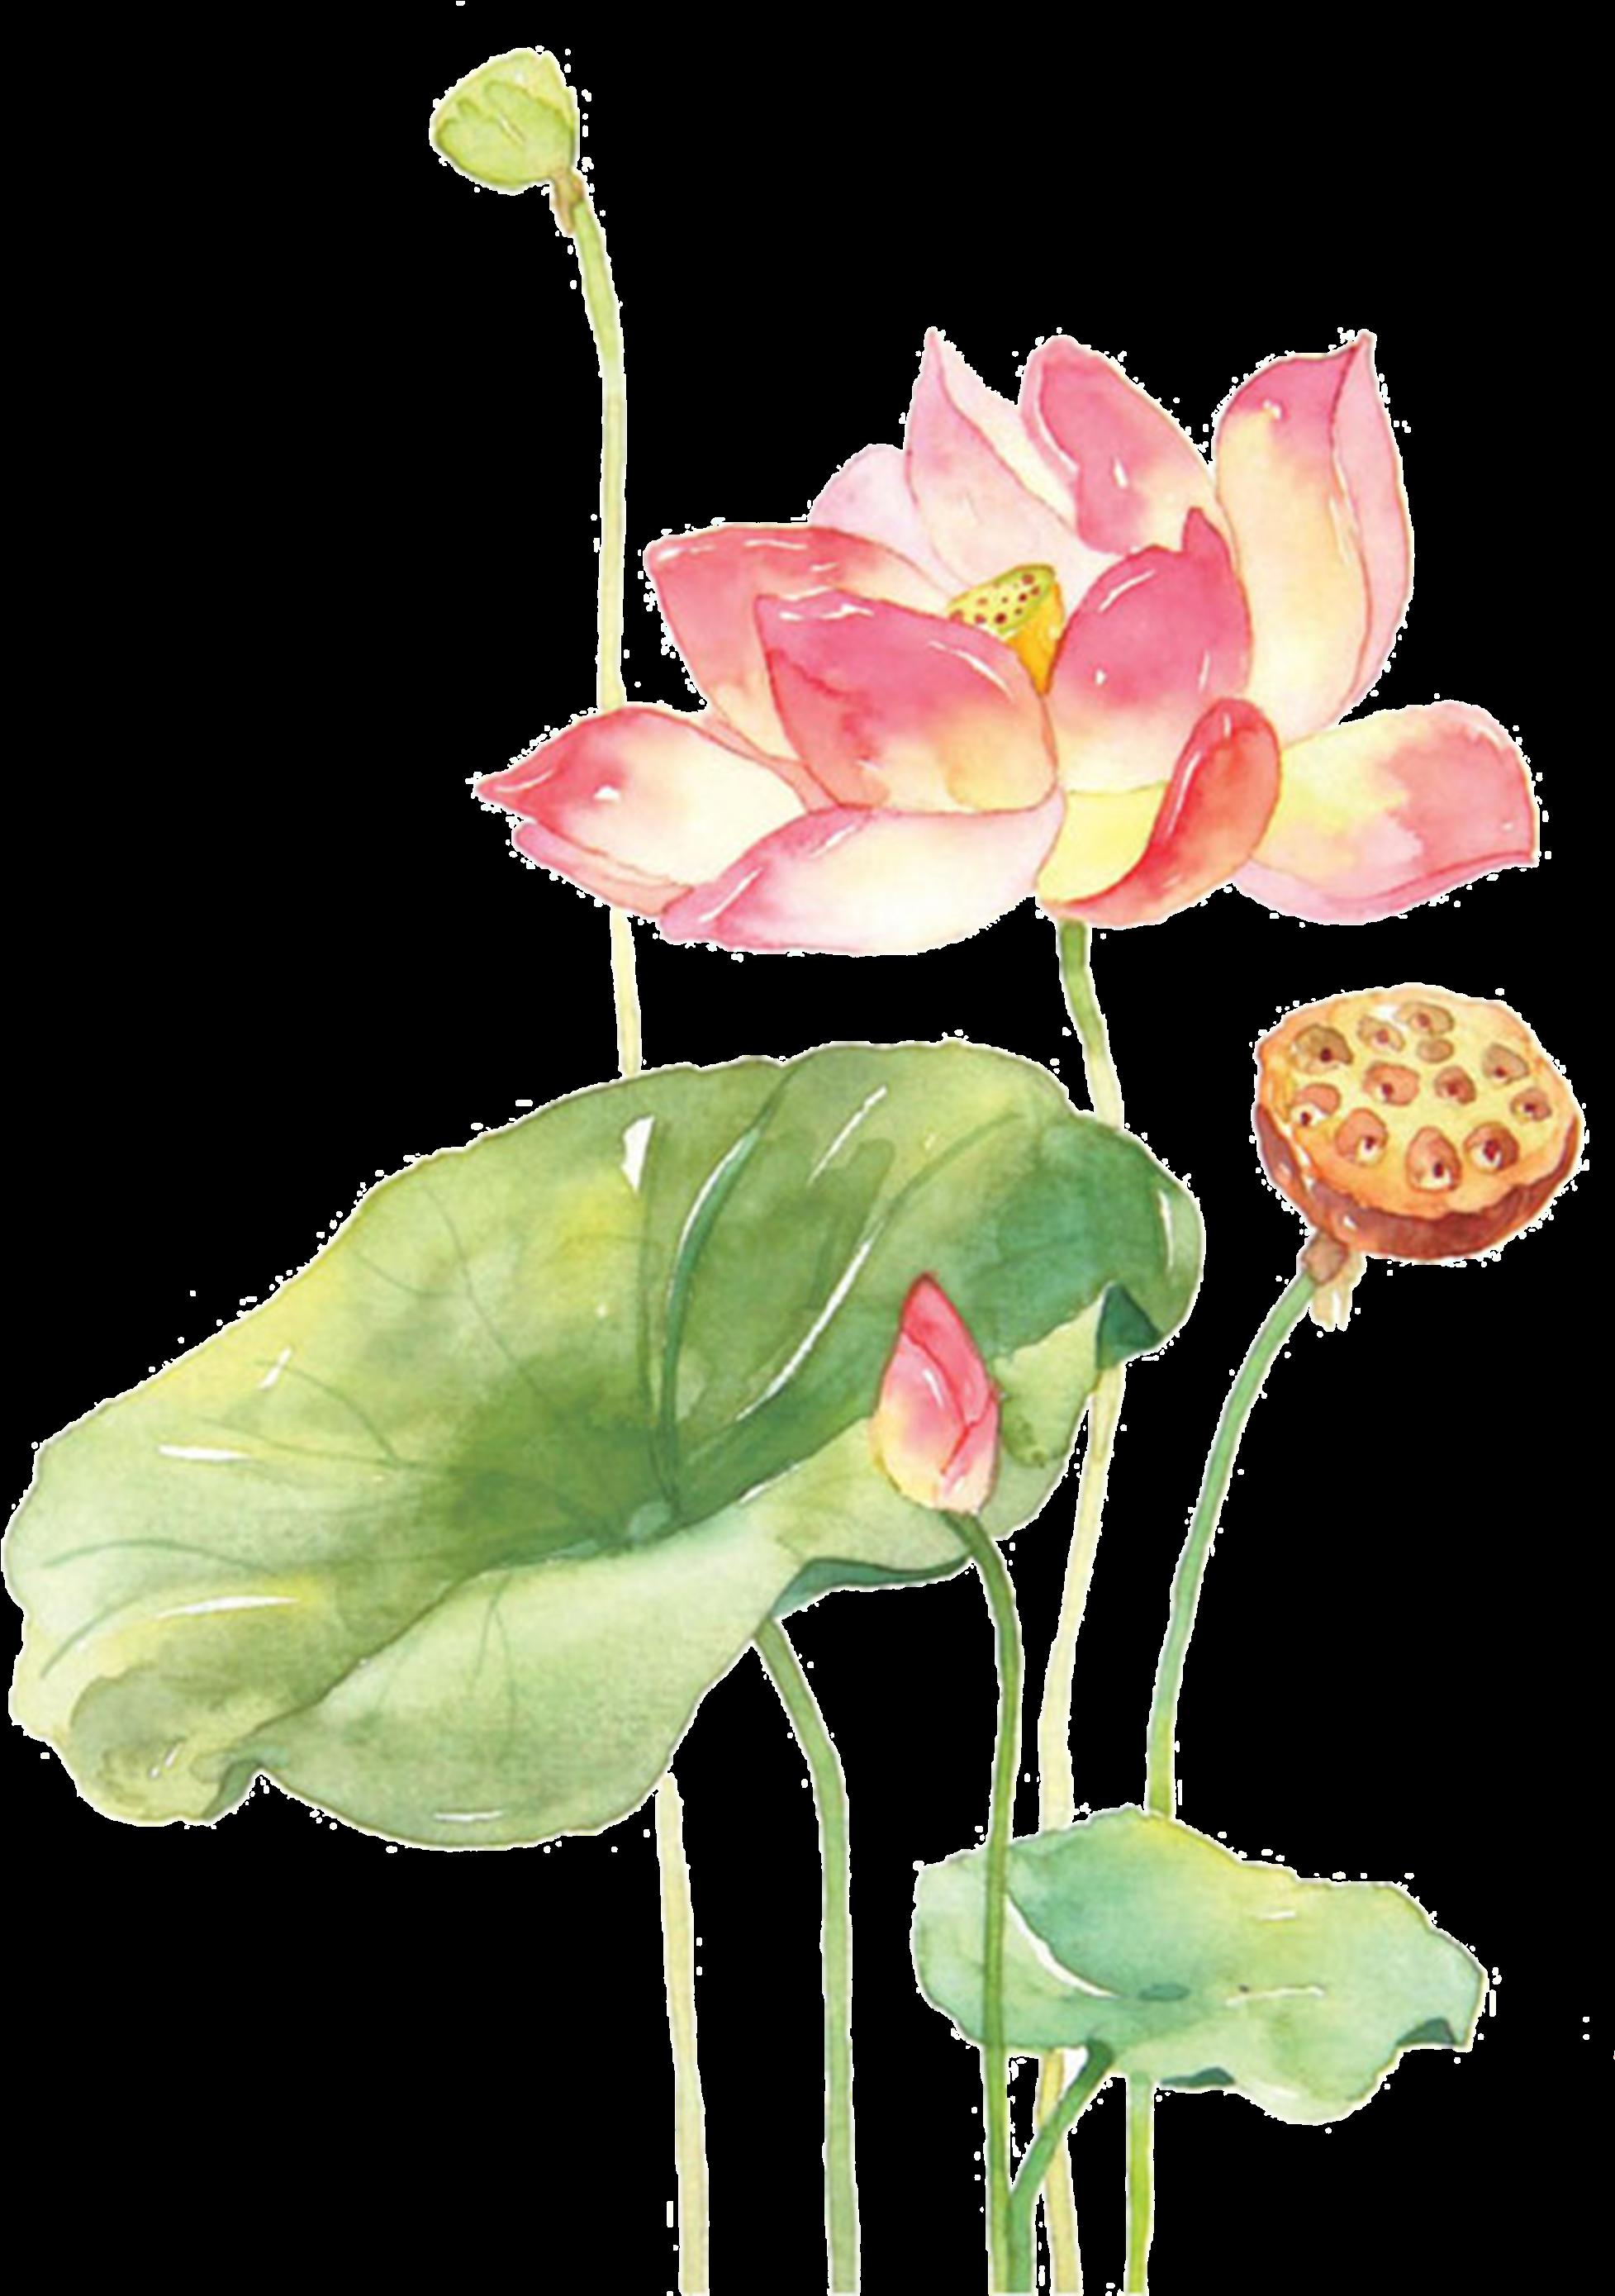 Ảnh vẽ hoa sen PNG